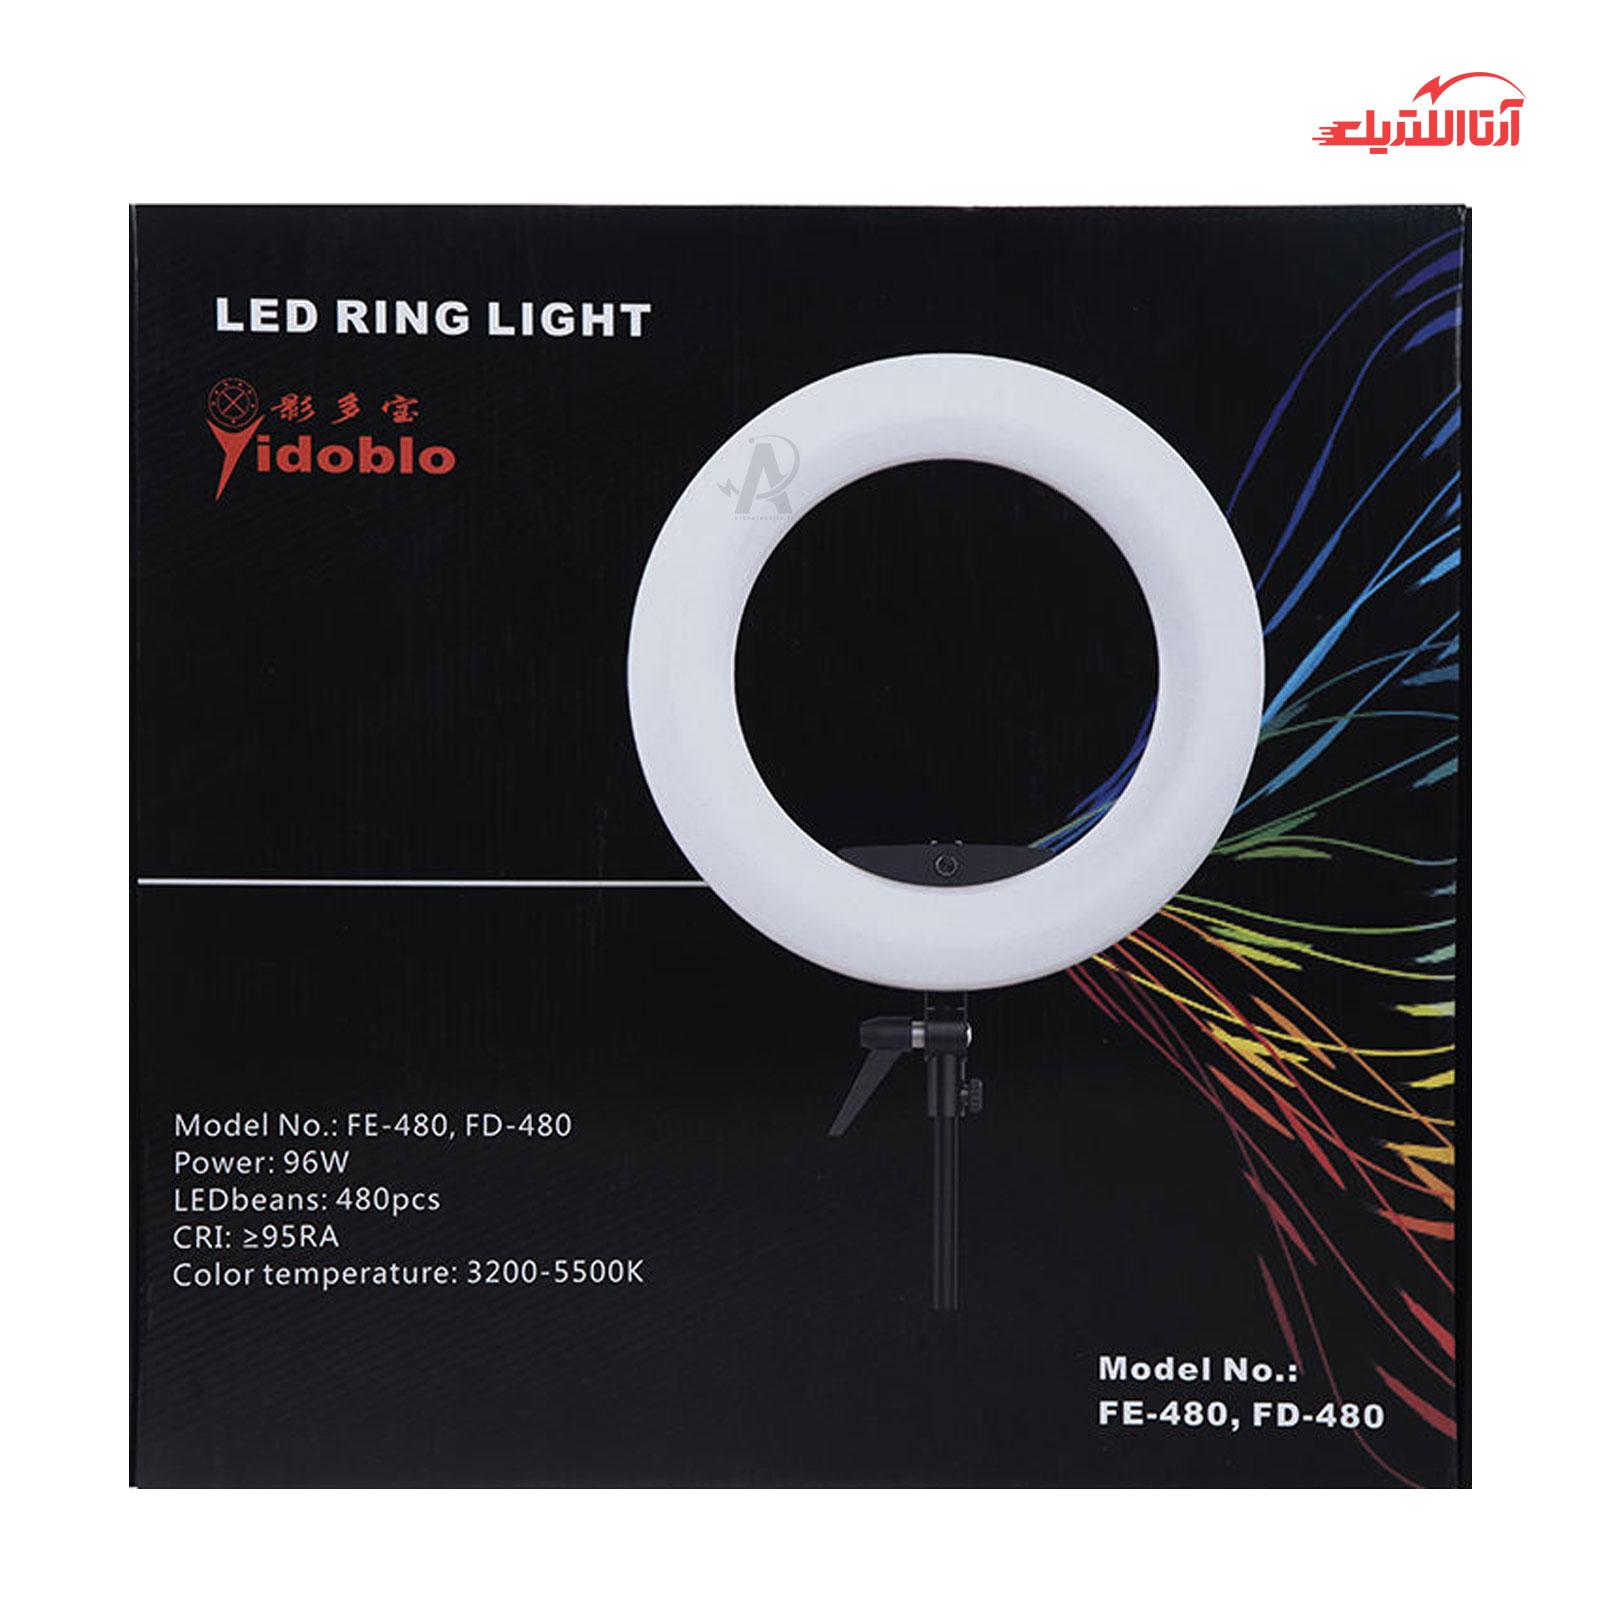 رینگ لایت مدل Yidoblo LED FE-480 II با سه پایه